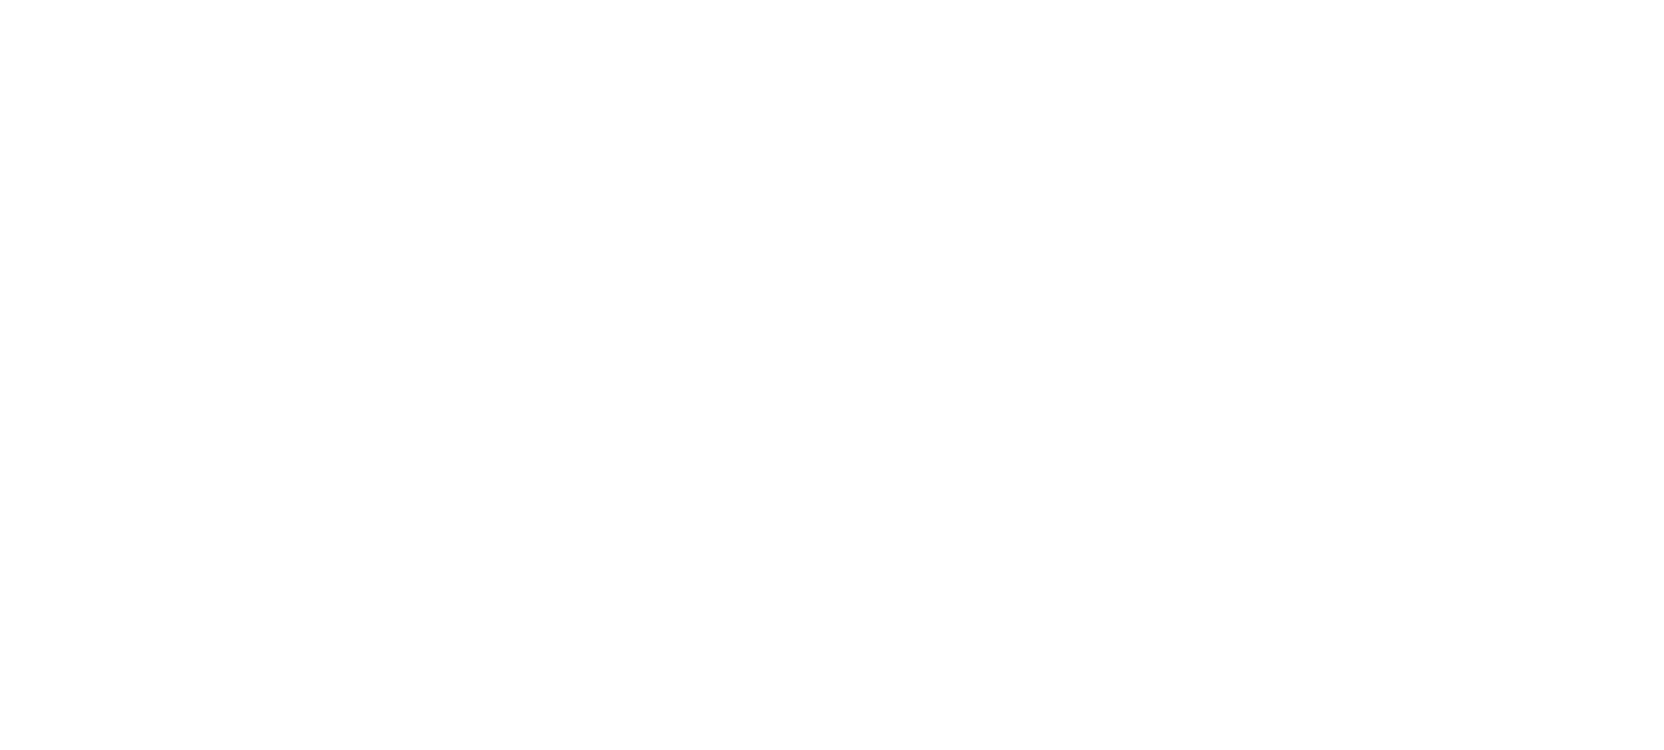 JetBlue Pilot Gateway Programs logo. Links to Home.